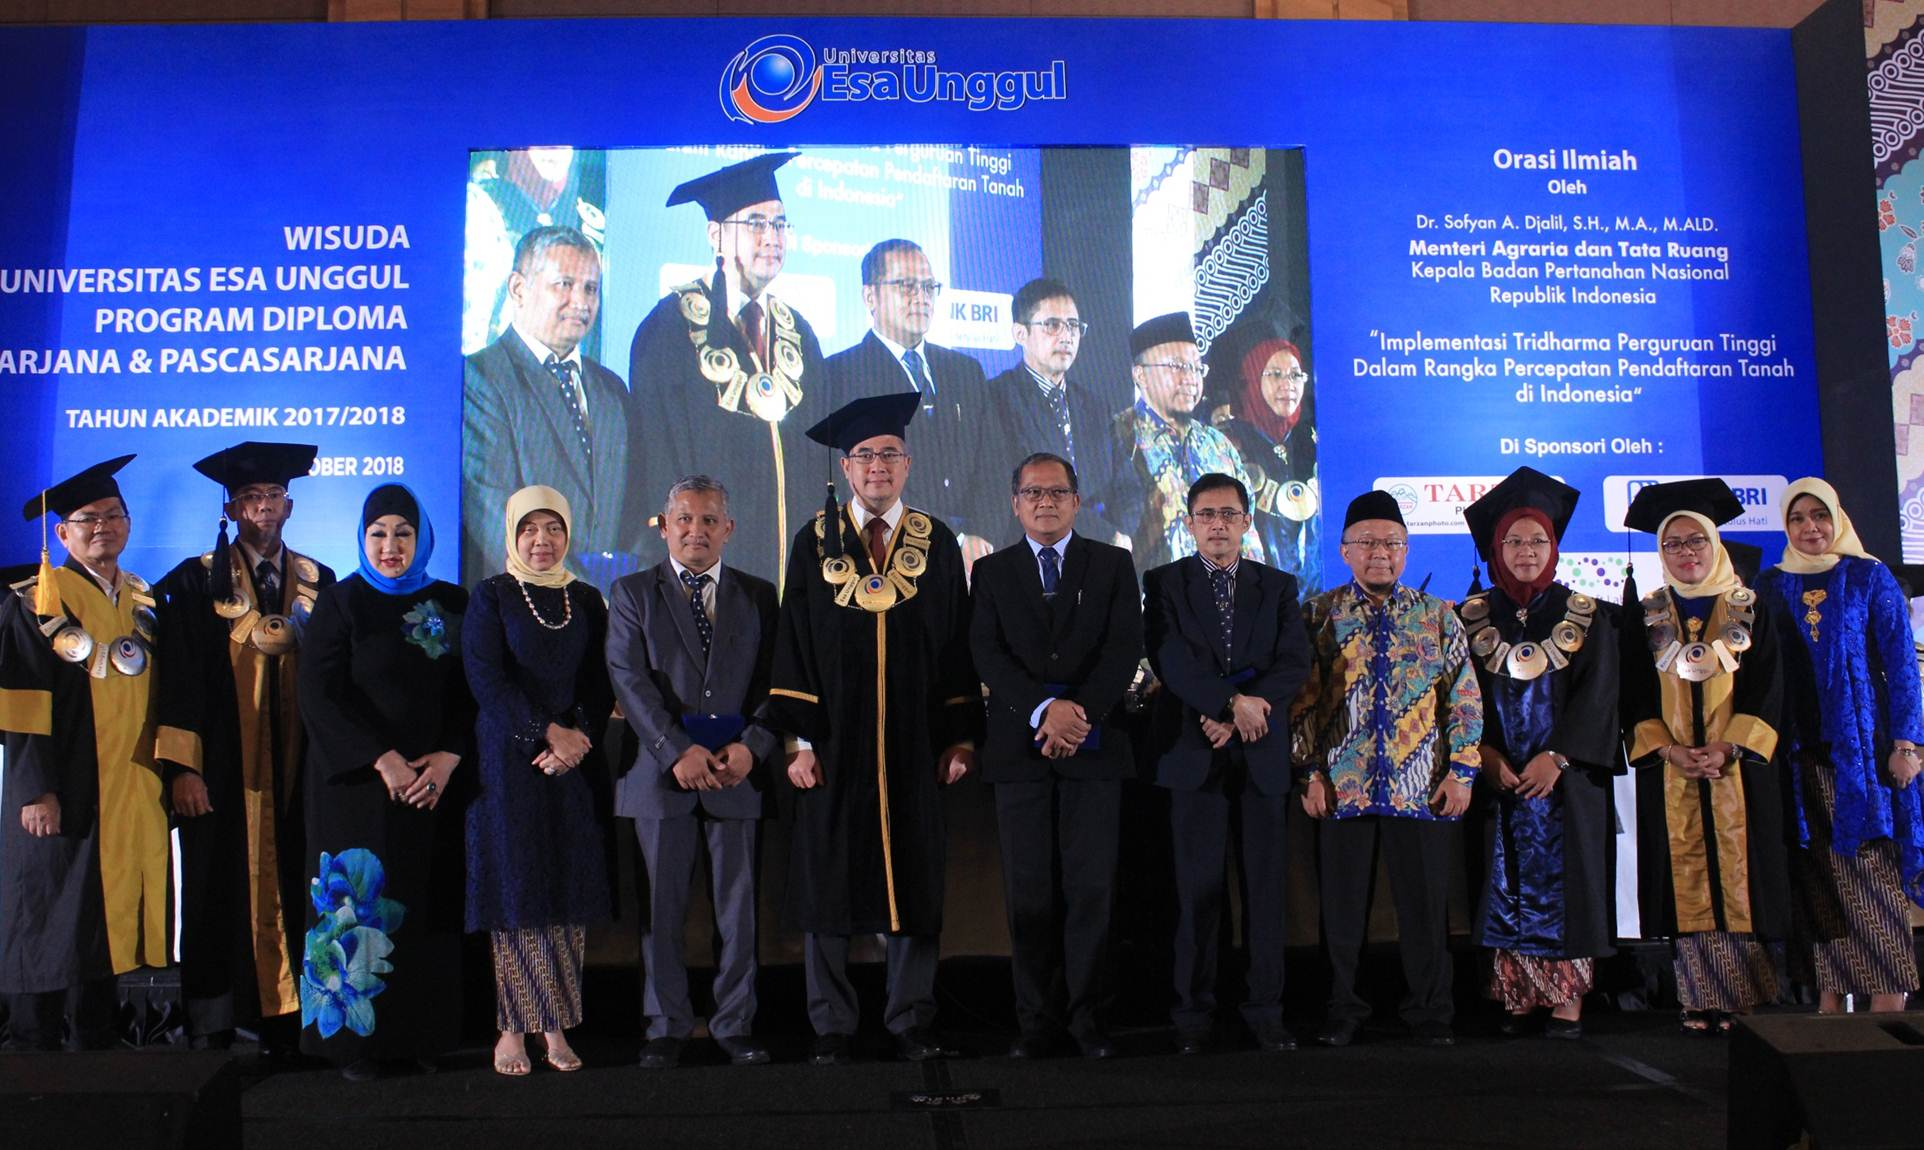 Foto Bersama Rektor Esa Unggul Dr.Ir. Arief Kusuma, M.B.A dengan Dirjen Infrastruktur Keagrariaan ATR BPN Ir. R.M. Adi Darmawan